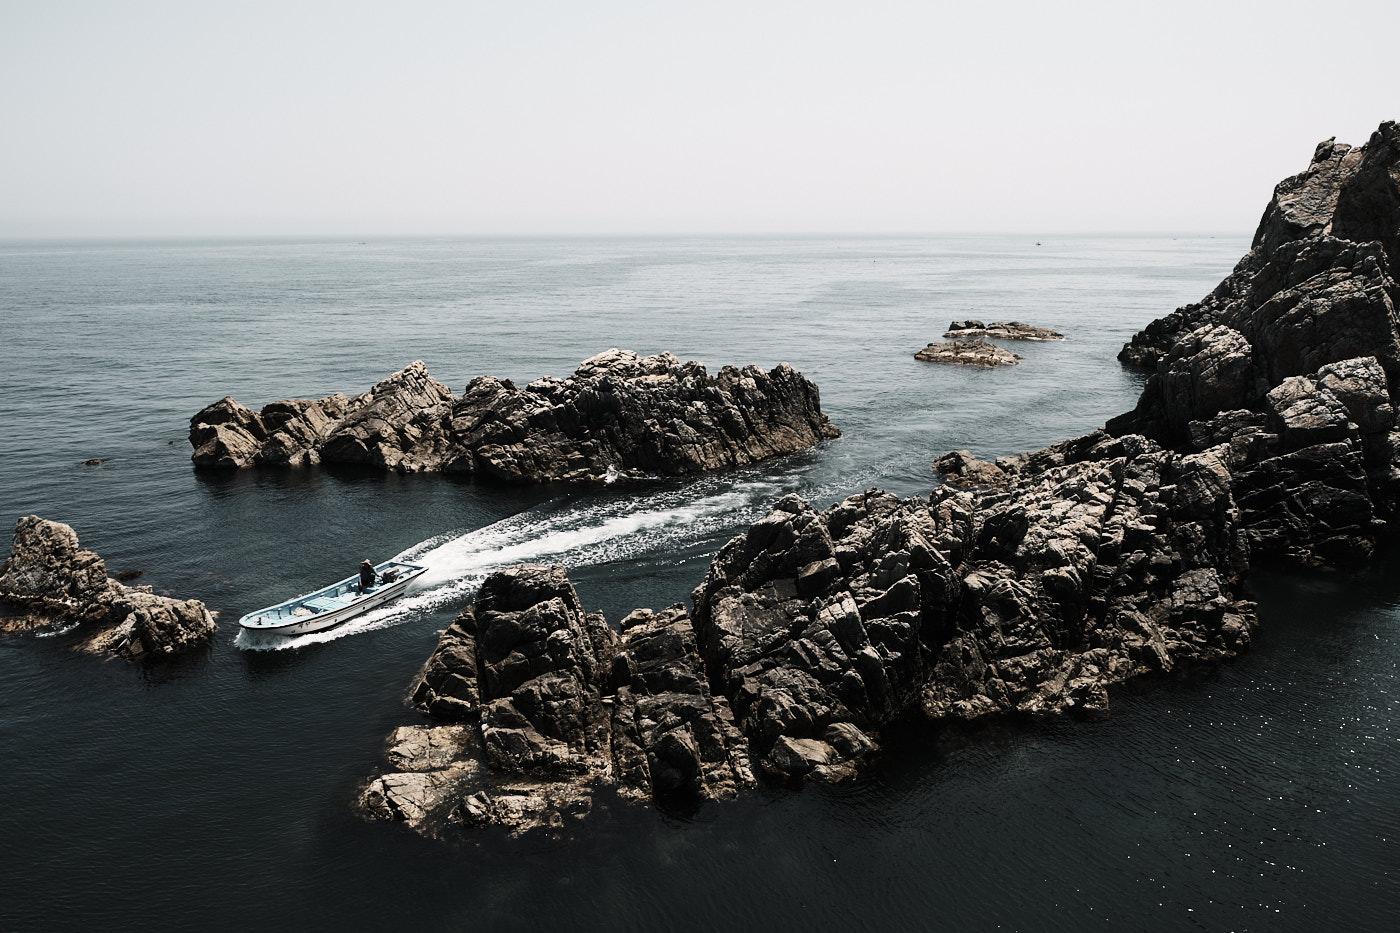 Fisherman - Samcheok, South Korea